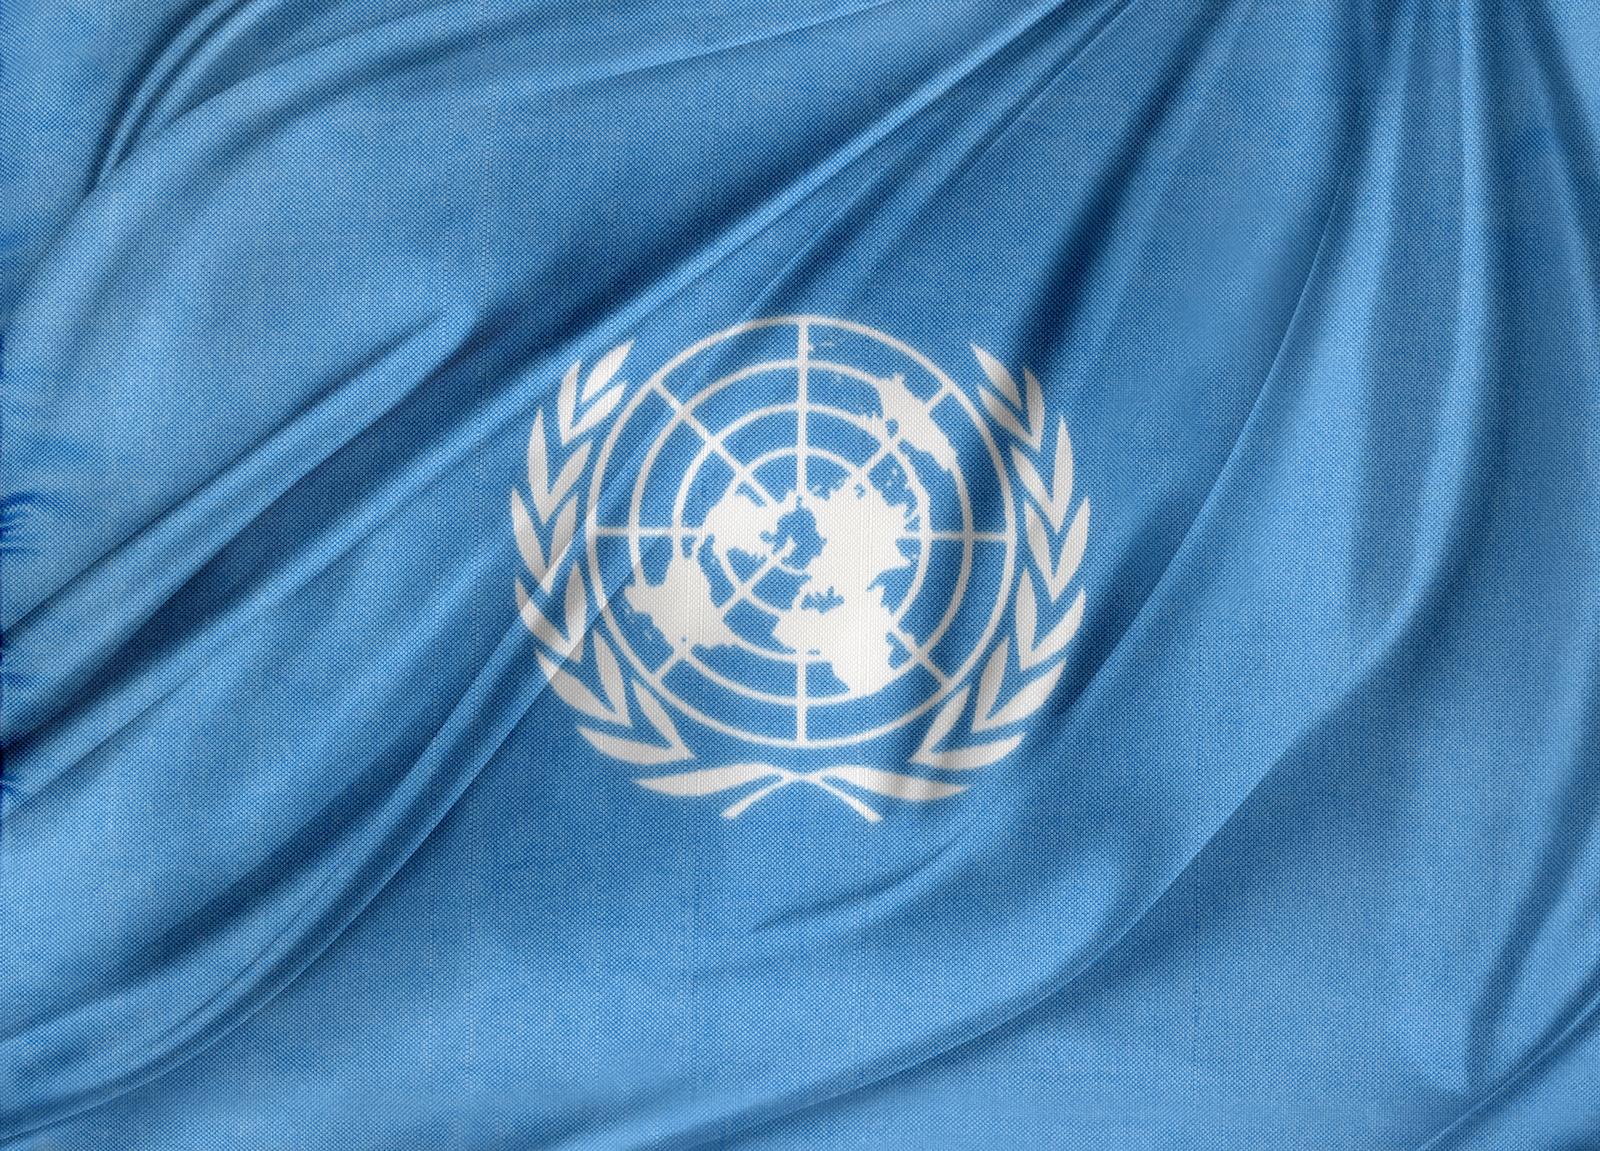 ООН уклала угоду з Україною на $675 млн